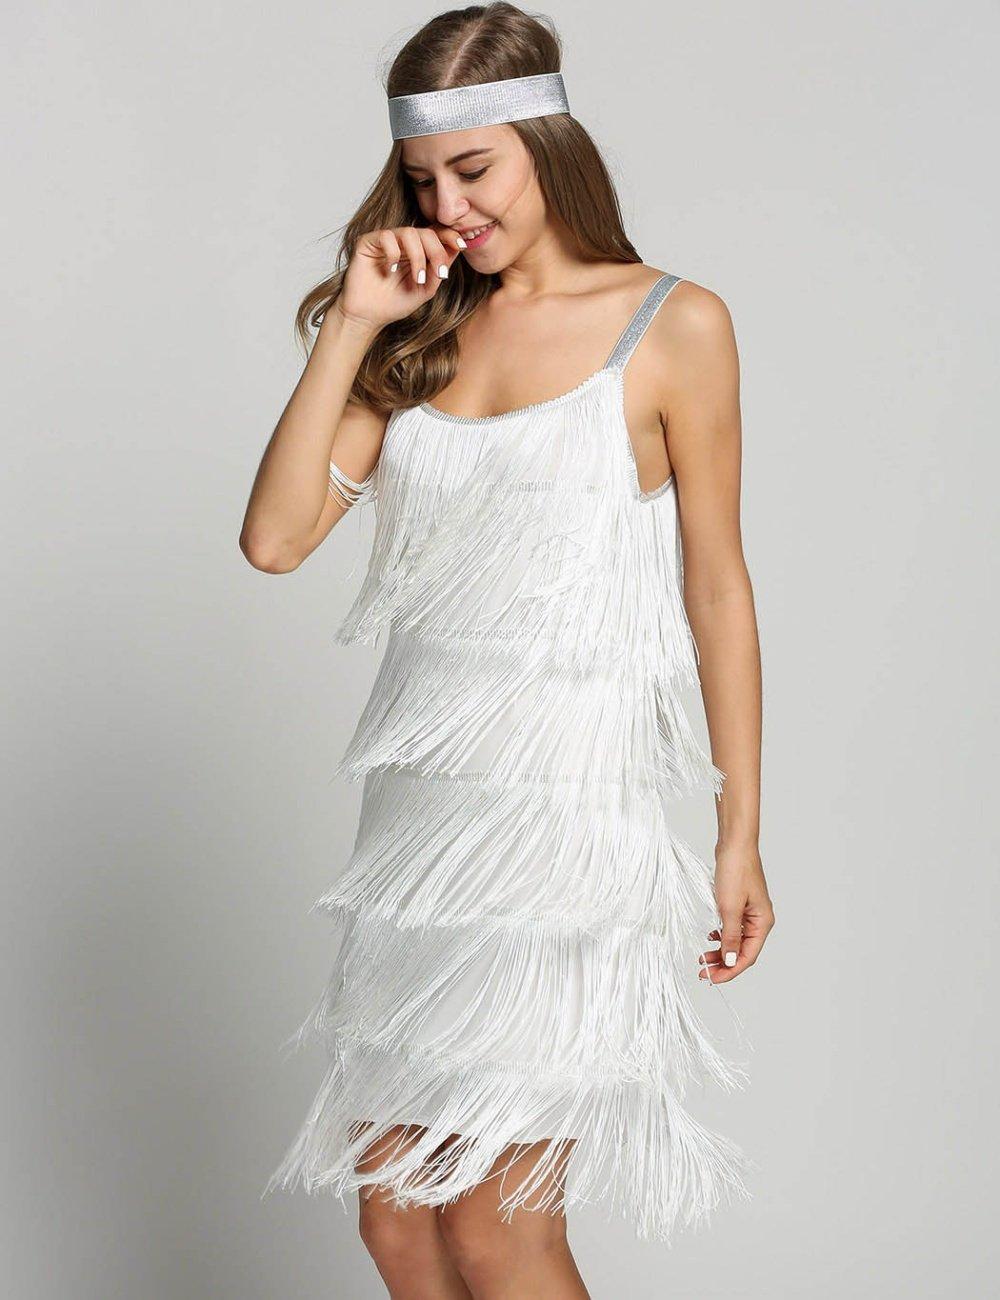 flapper fringe dress (12)